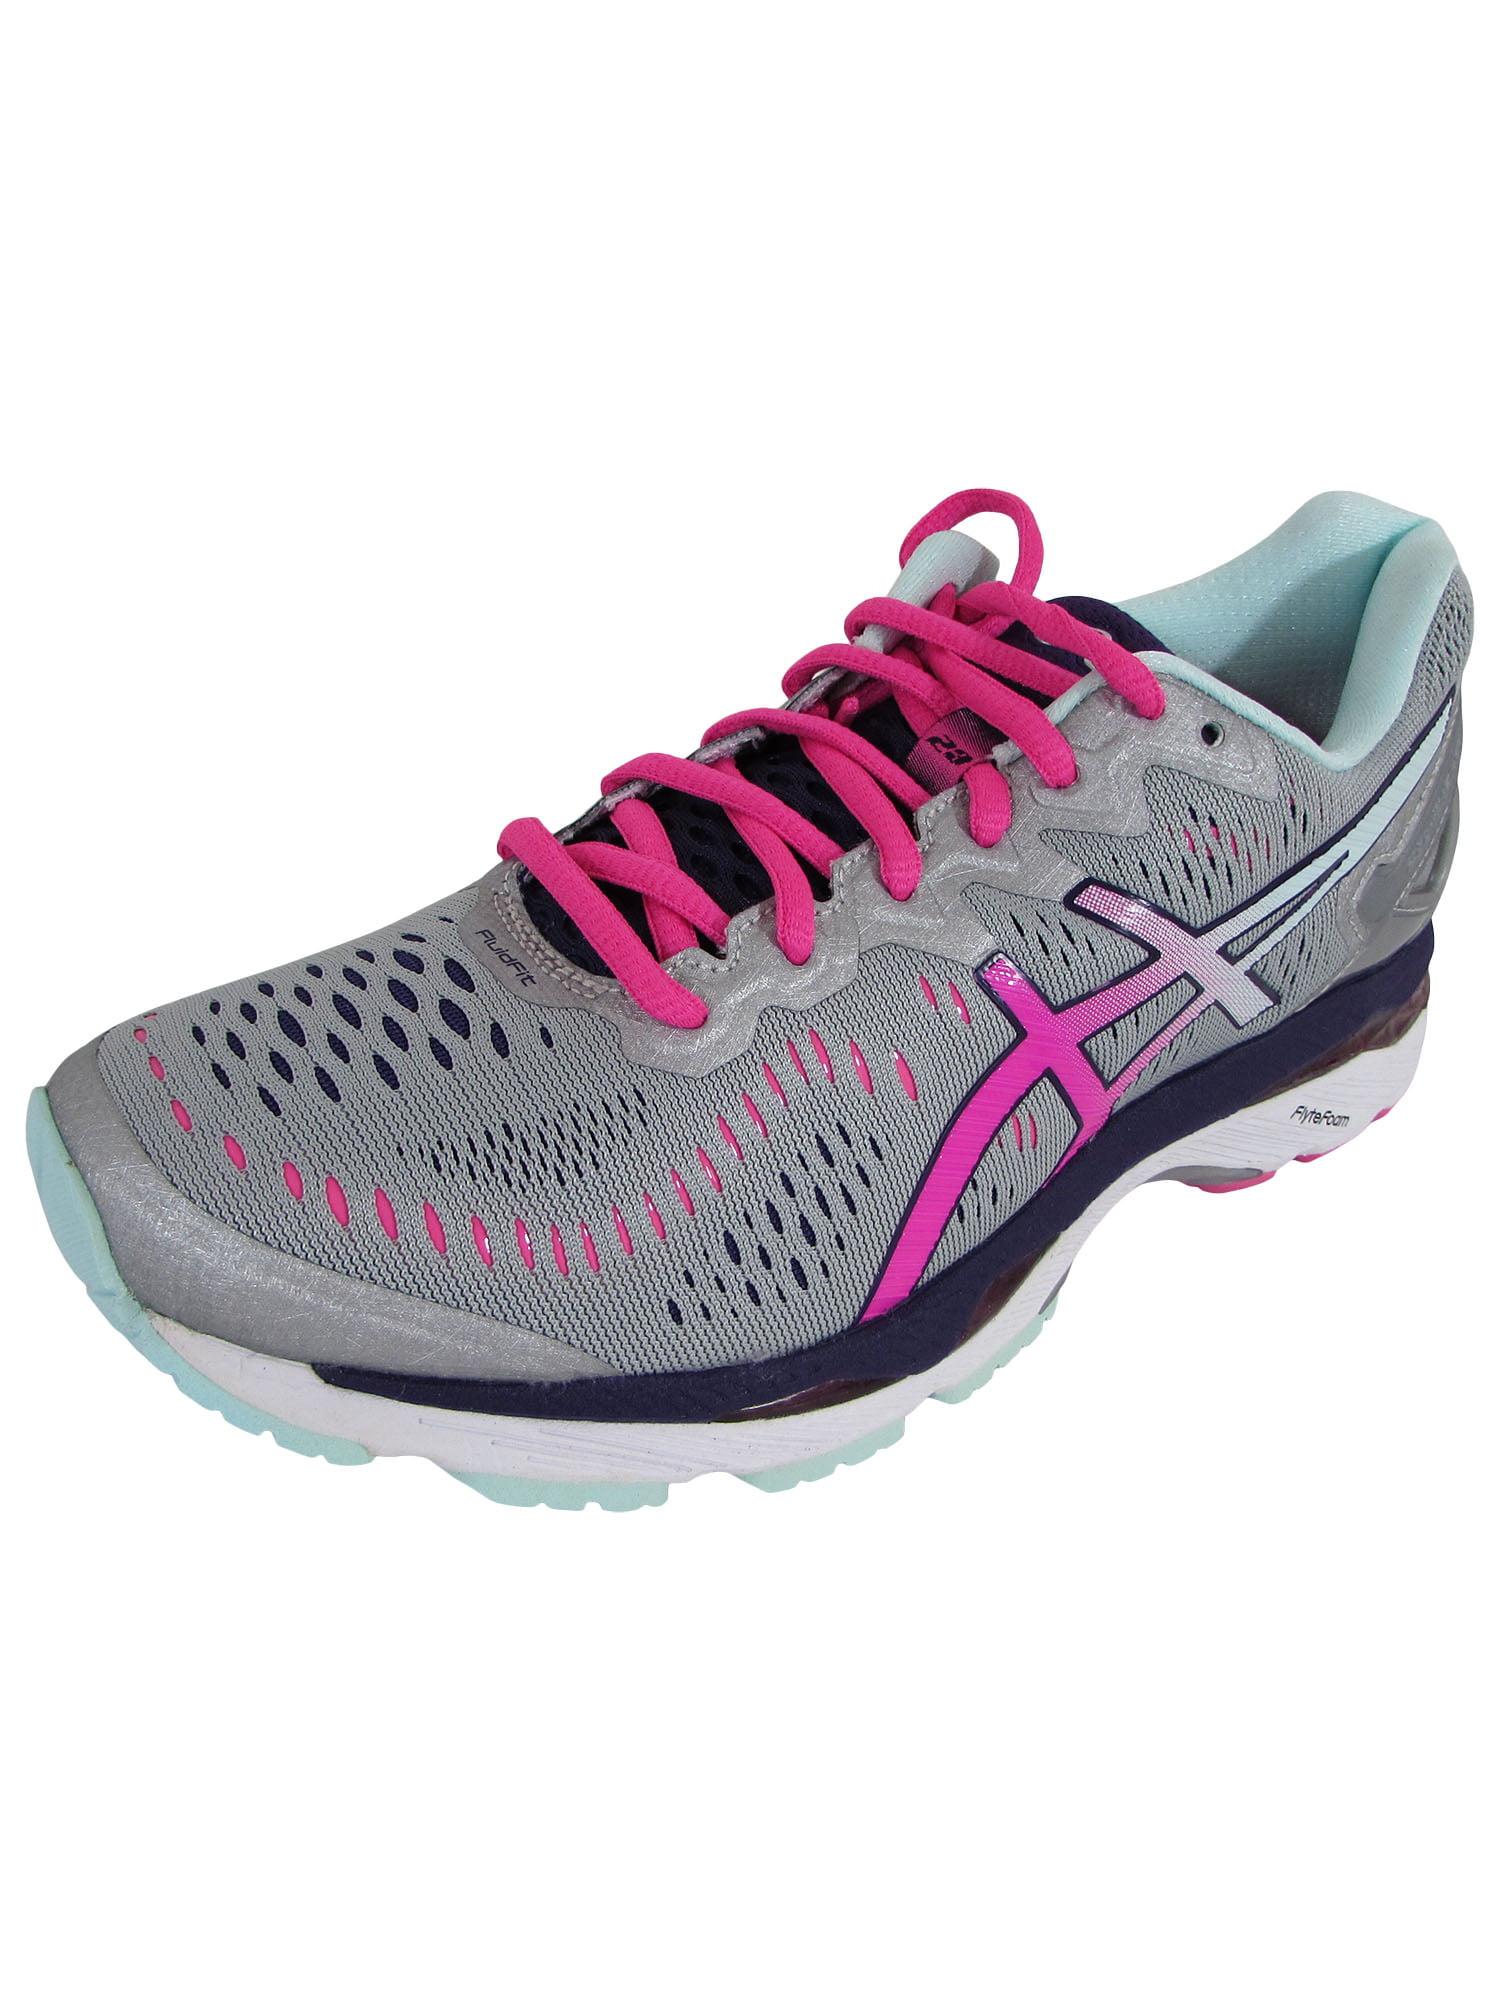 Asics Womens GEL-Kayano 23 Running Shoes